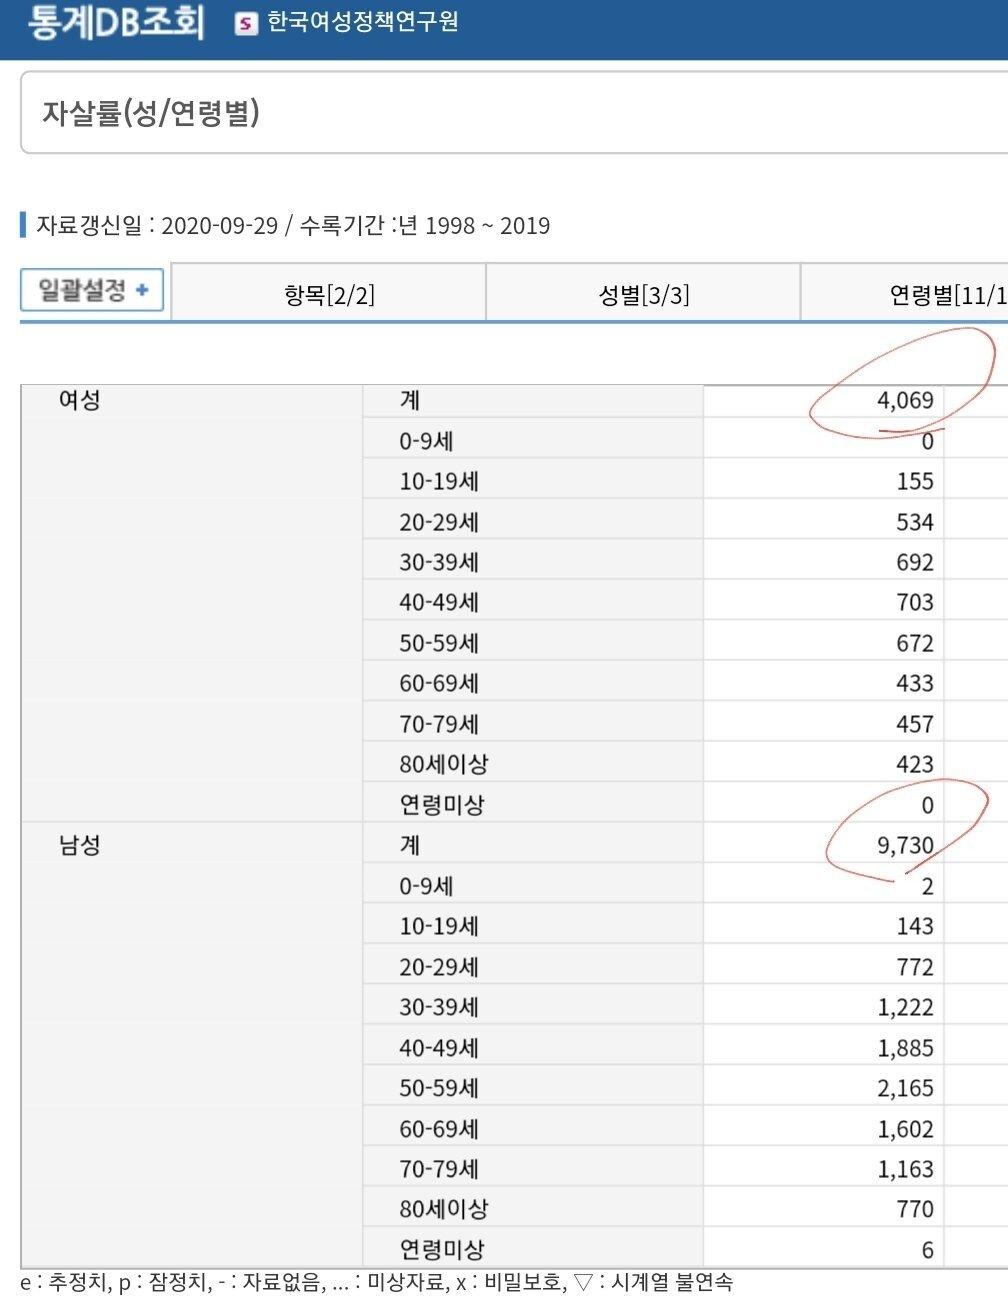 4230d65e976741681d315b4121aa977c_11307156848.jpg [속보] 한국여자들 자사율 급증 jpg